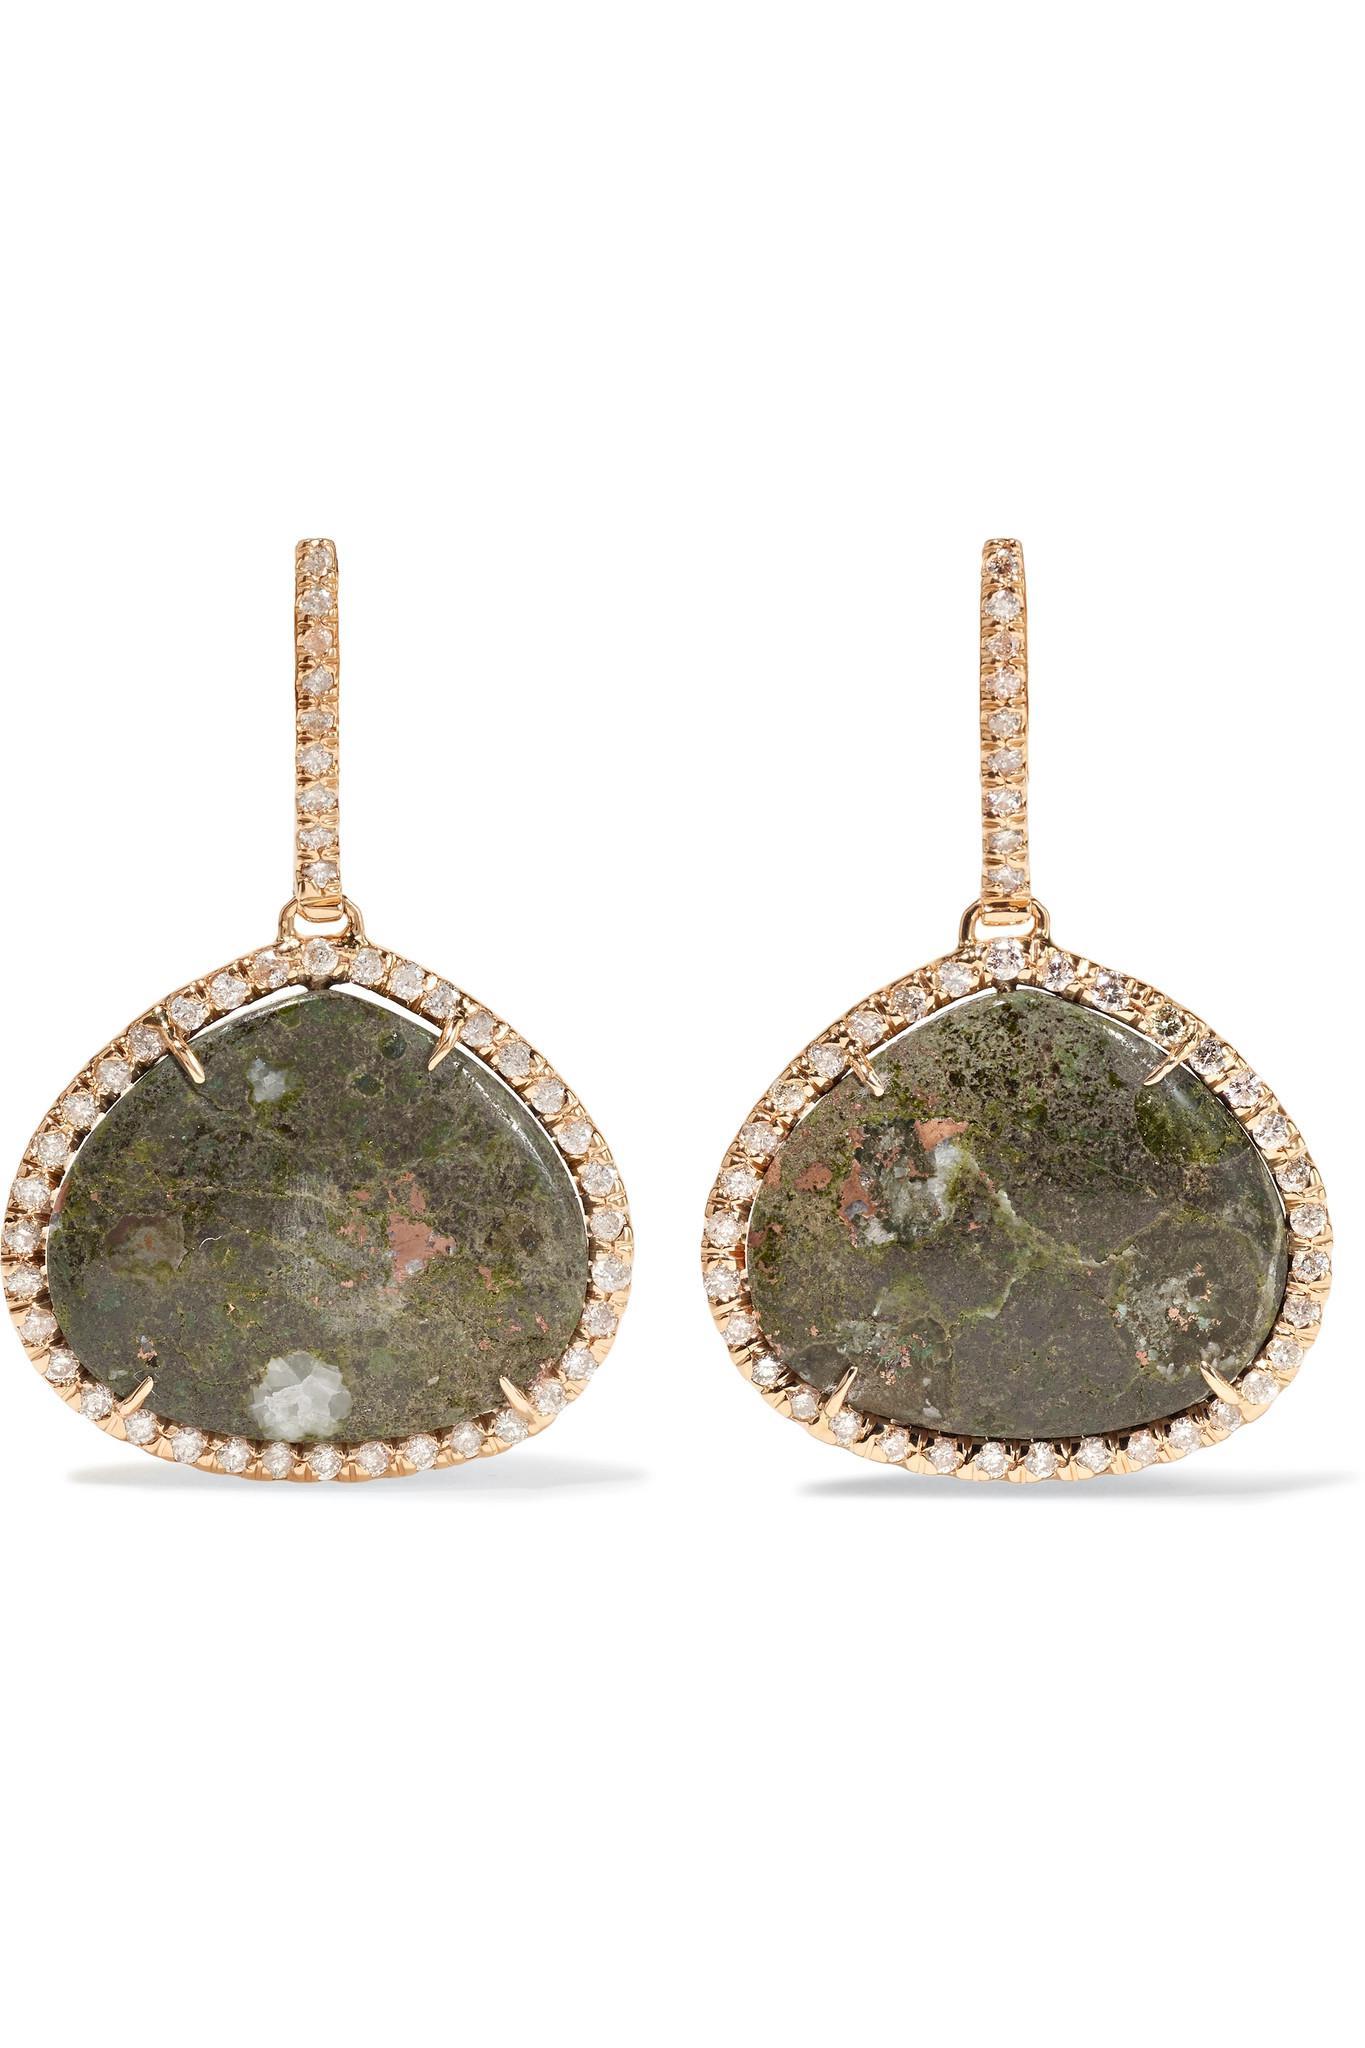 Kimberly McDonald 18-karat Rose Gold, Copper Ore And Diamond Earrings